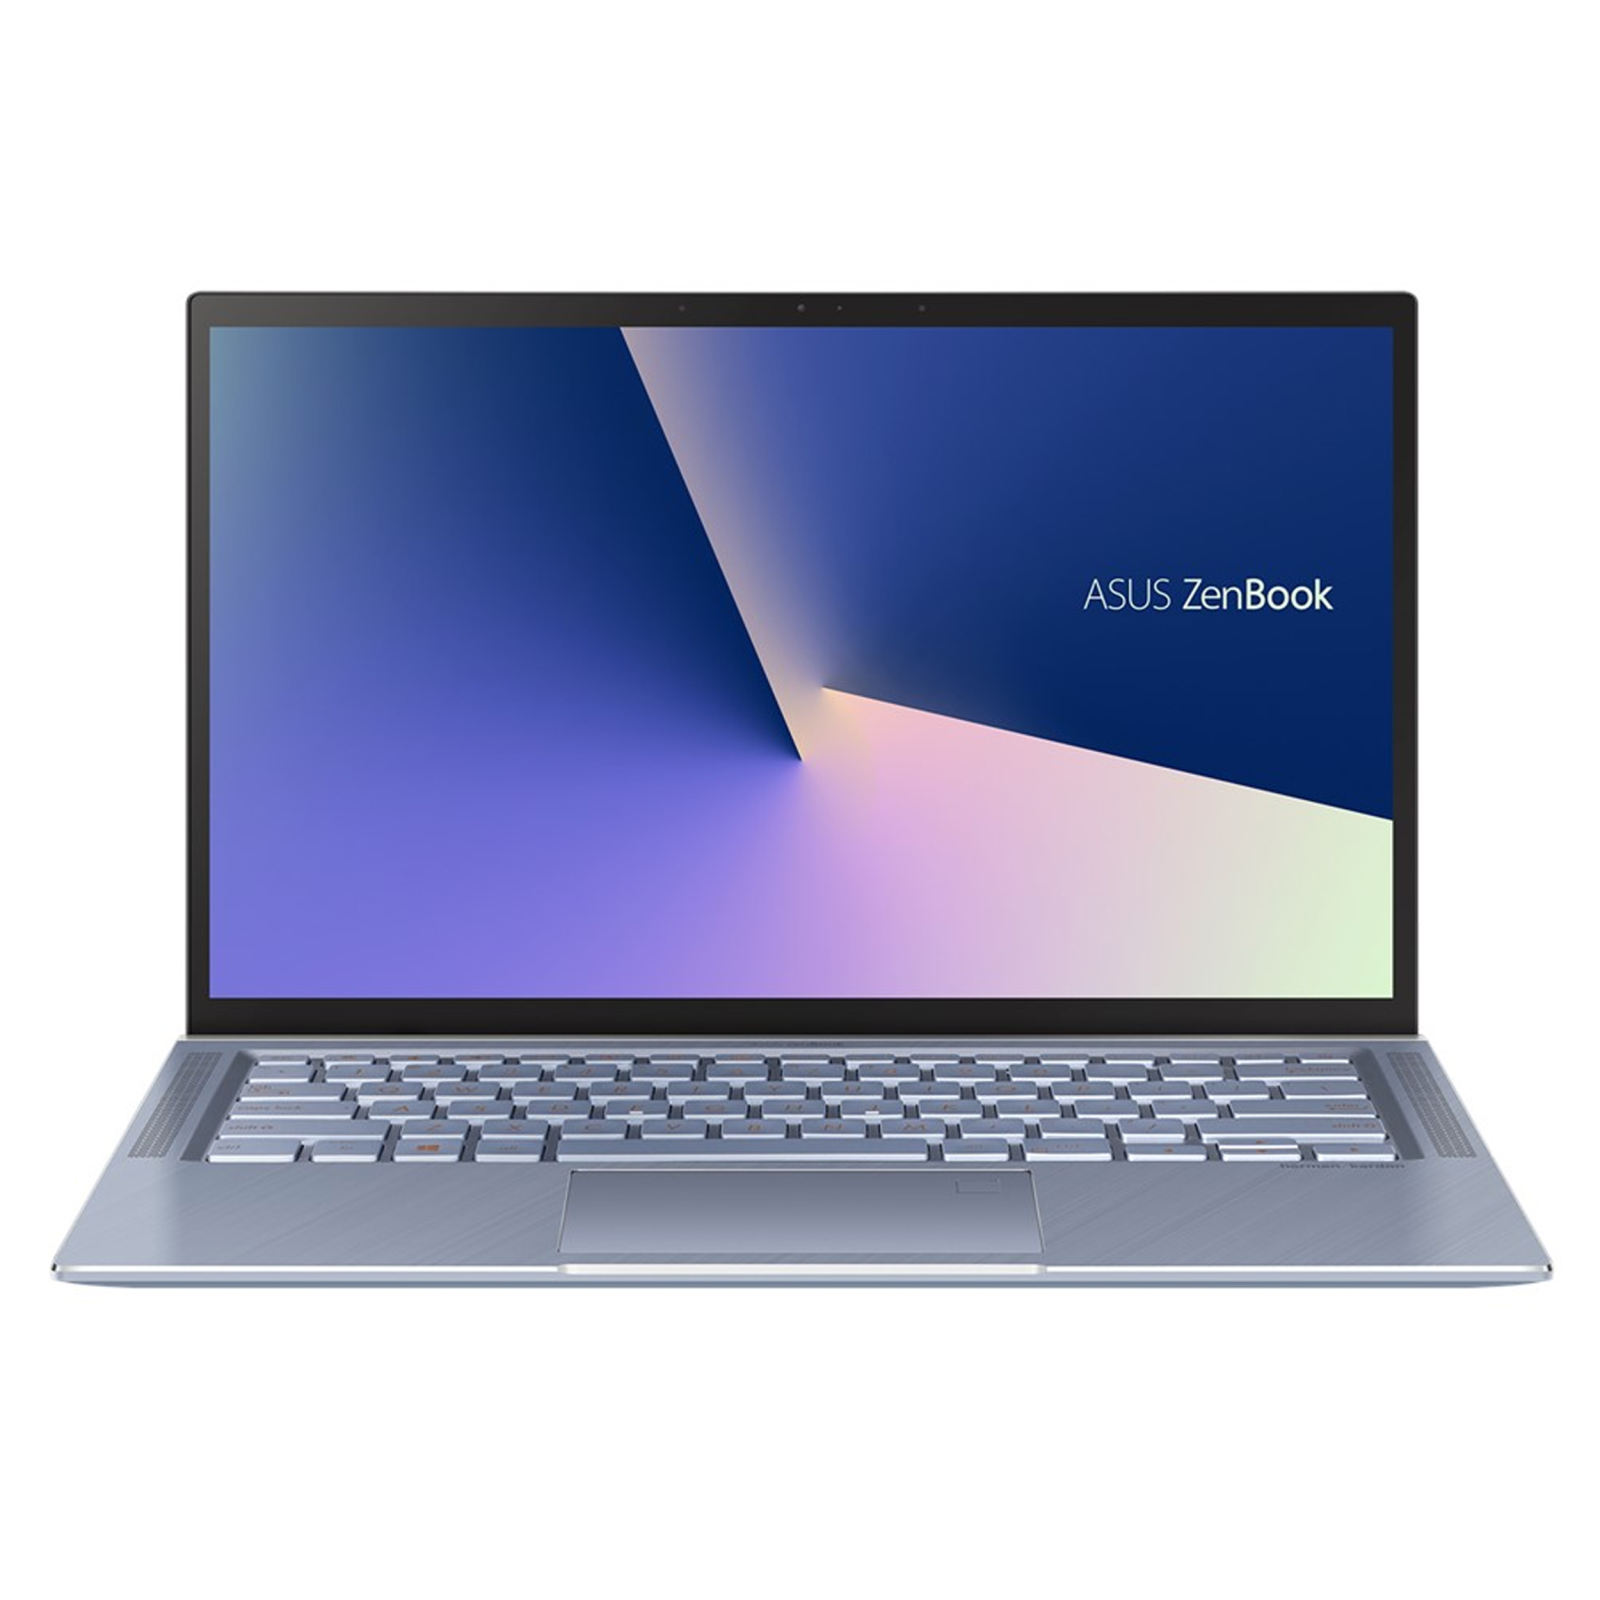 لپتاپ 14 اینچی ایسوس مدل ASUS ZenBook UX431FL-i7-16GB-512GB-2GB